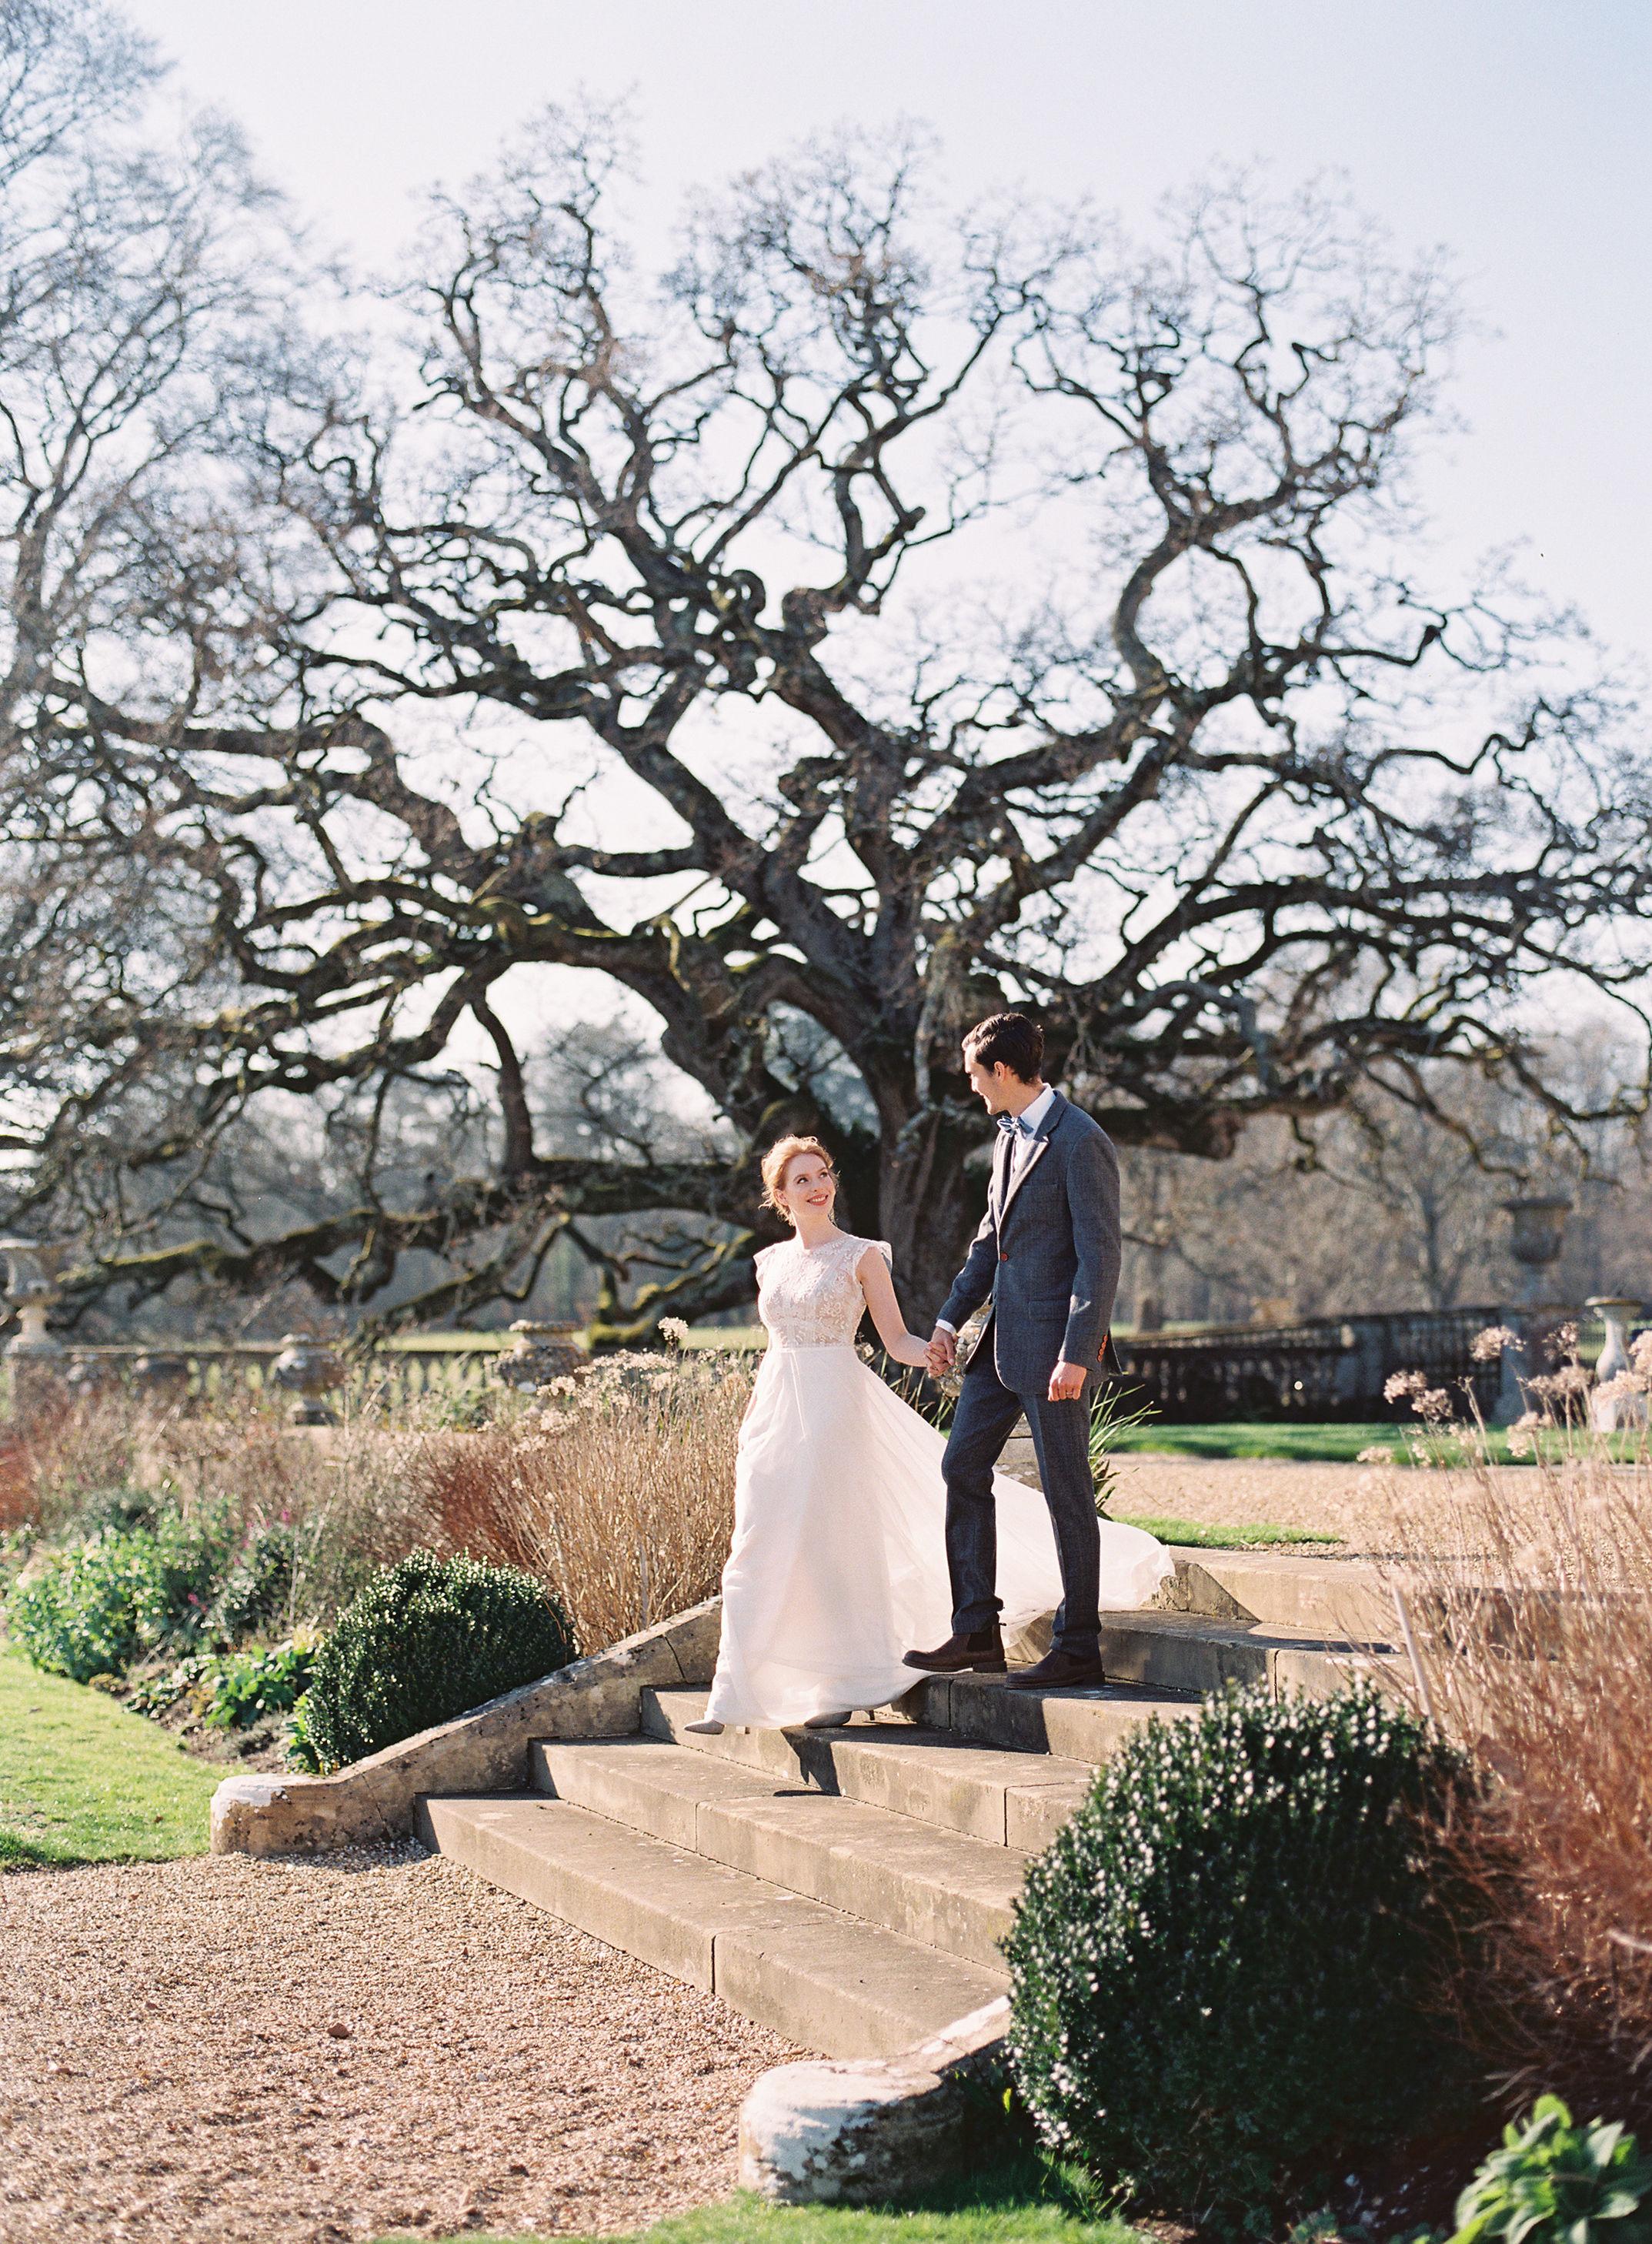 The Timeless Stylist-A Forgotten Love Story-Fine Art Wedding Editorial-Heirloom Wedding Styling 64.jpg